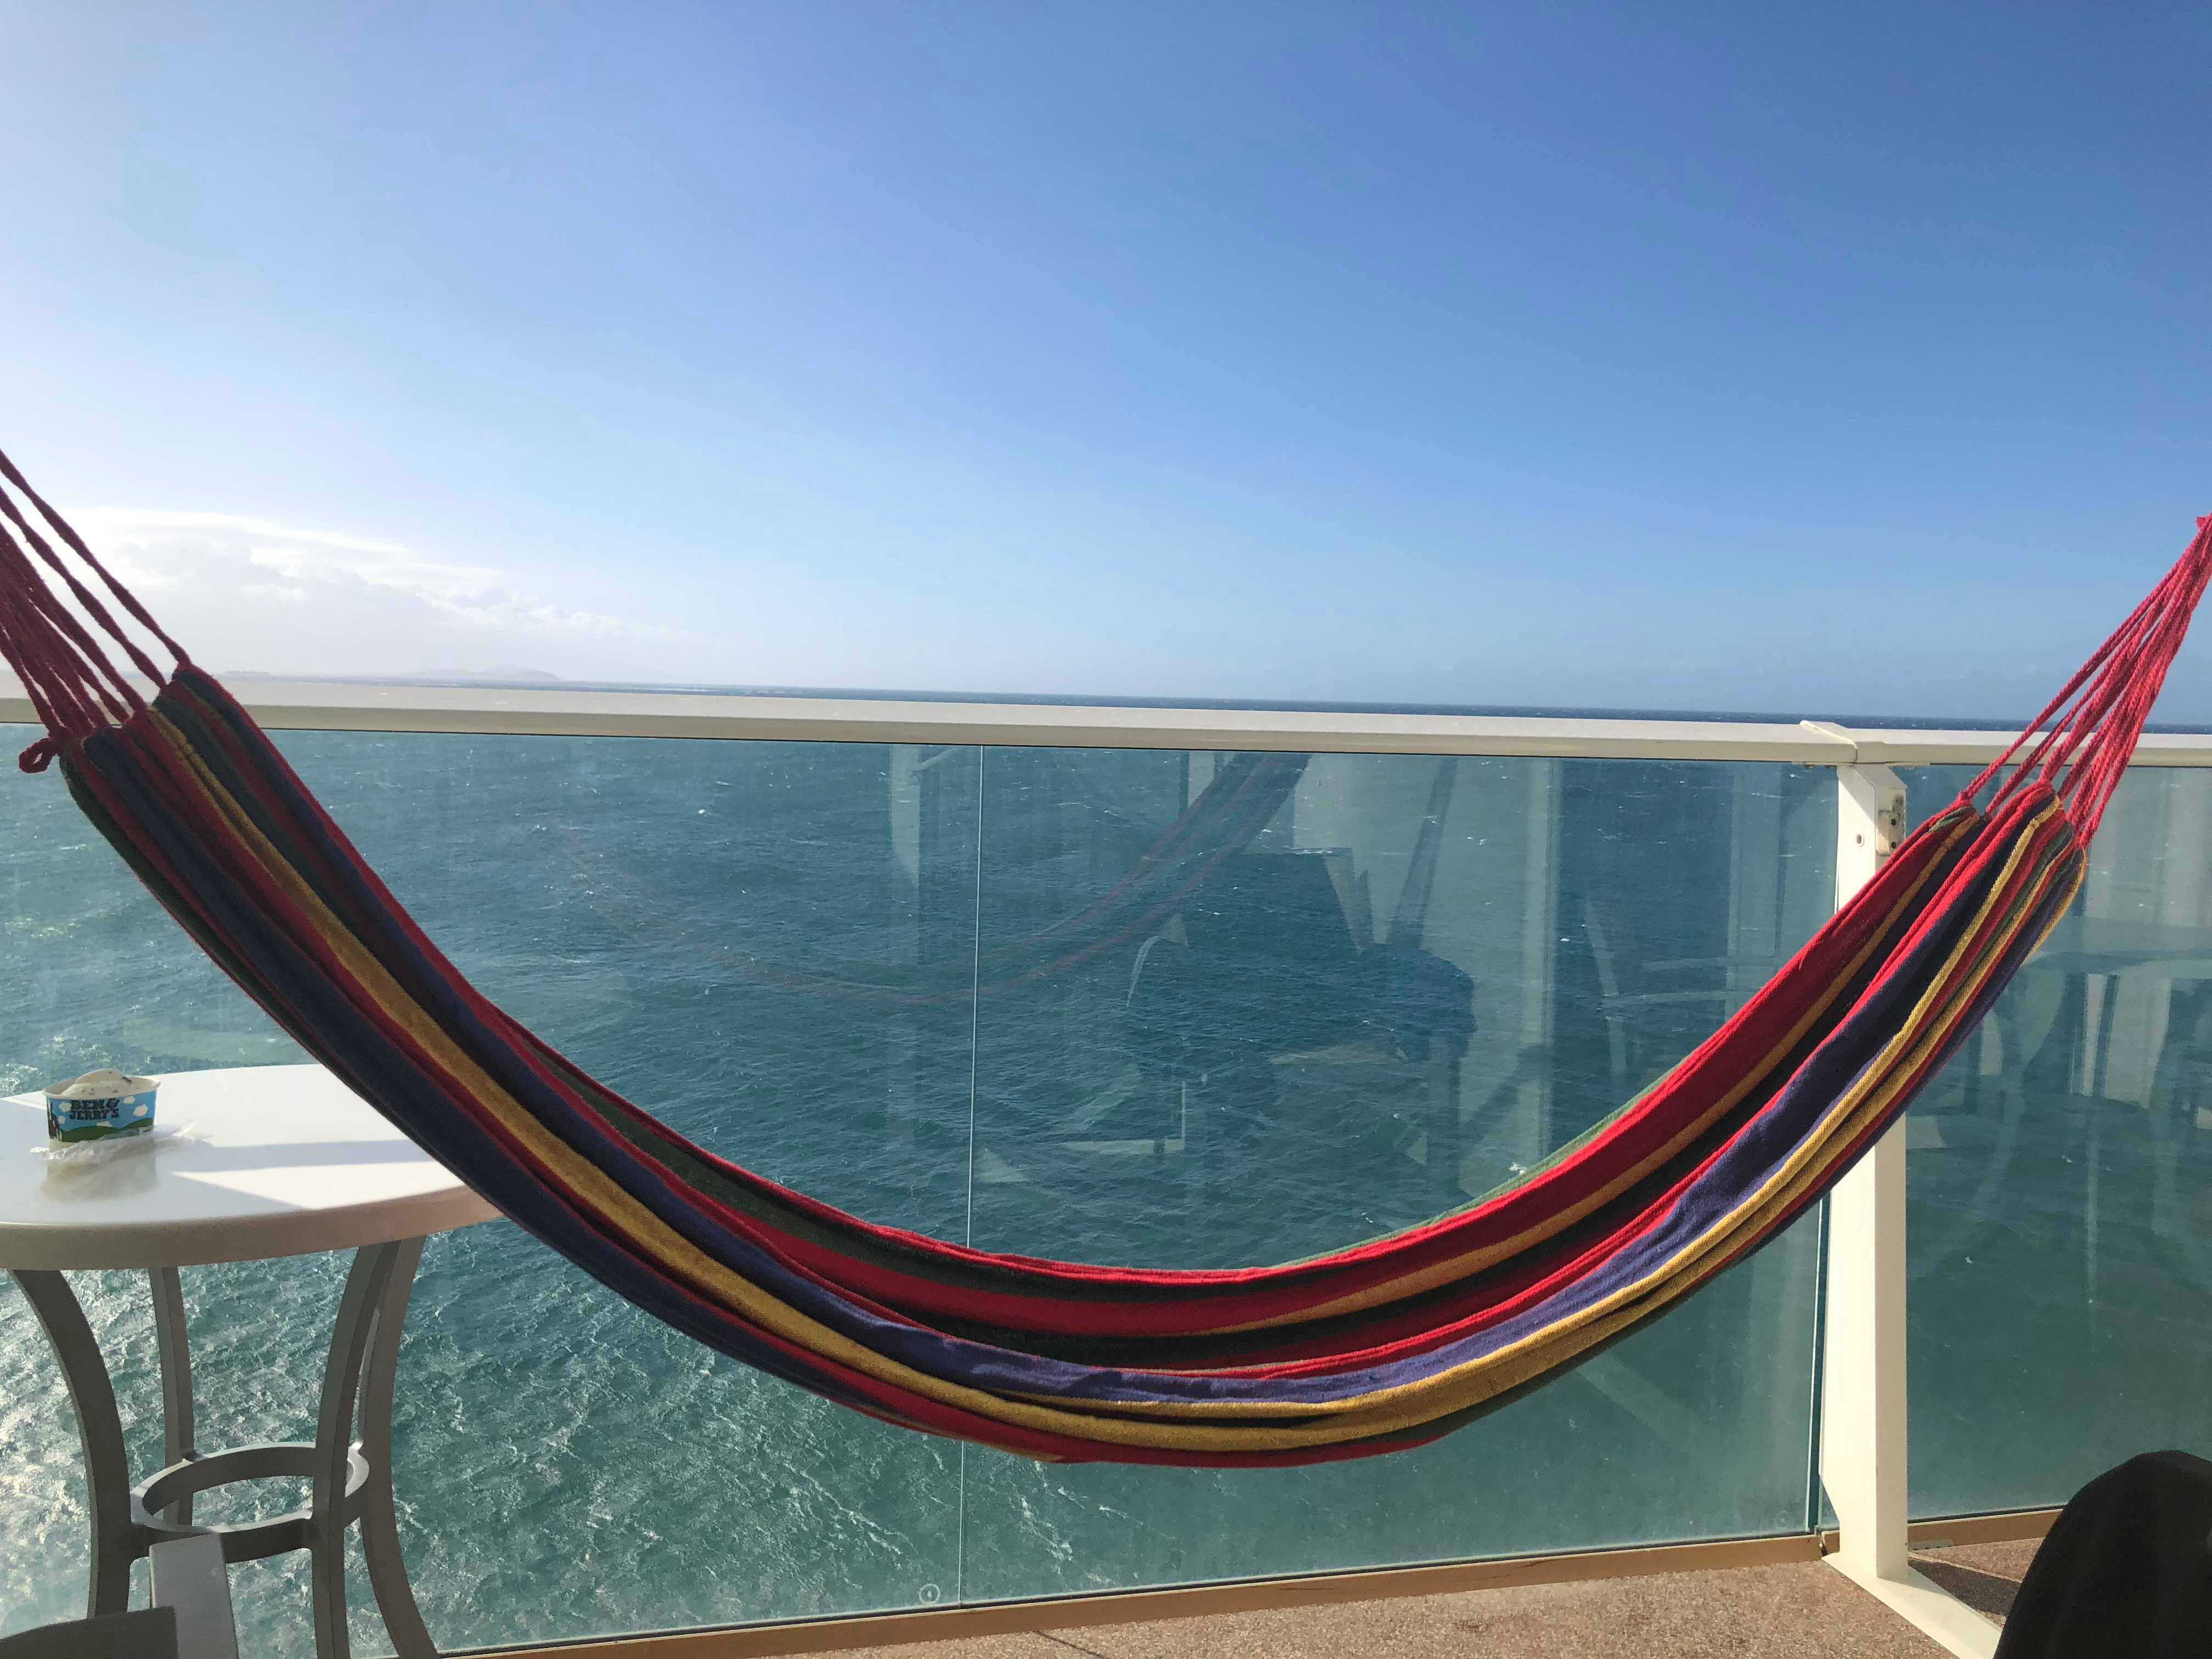 How to set up a Hammock on a Cruise Ship Balcony!